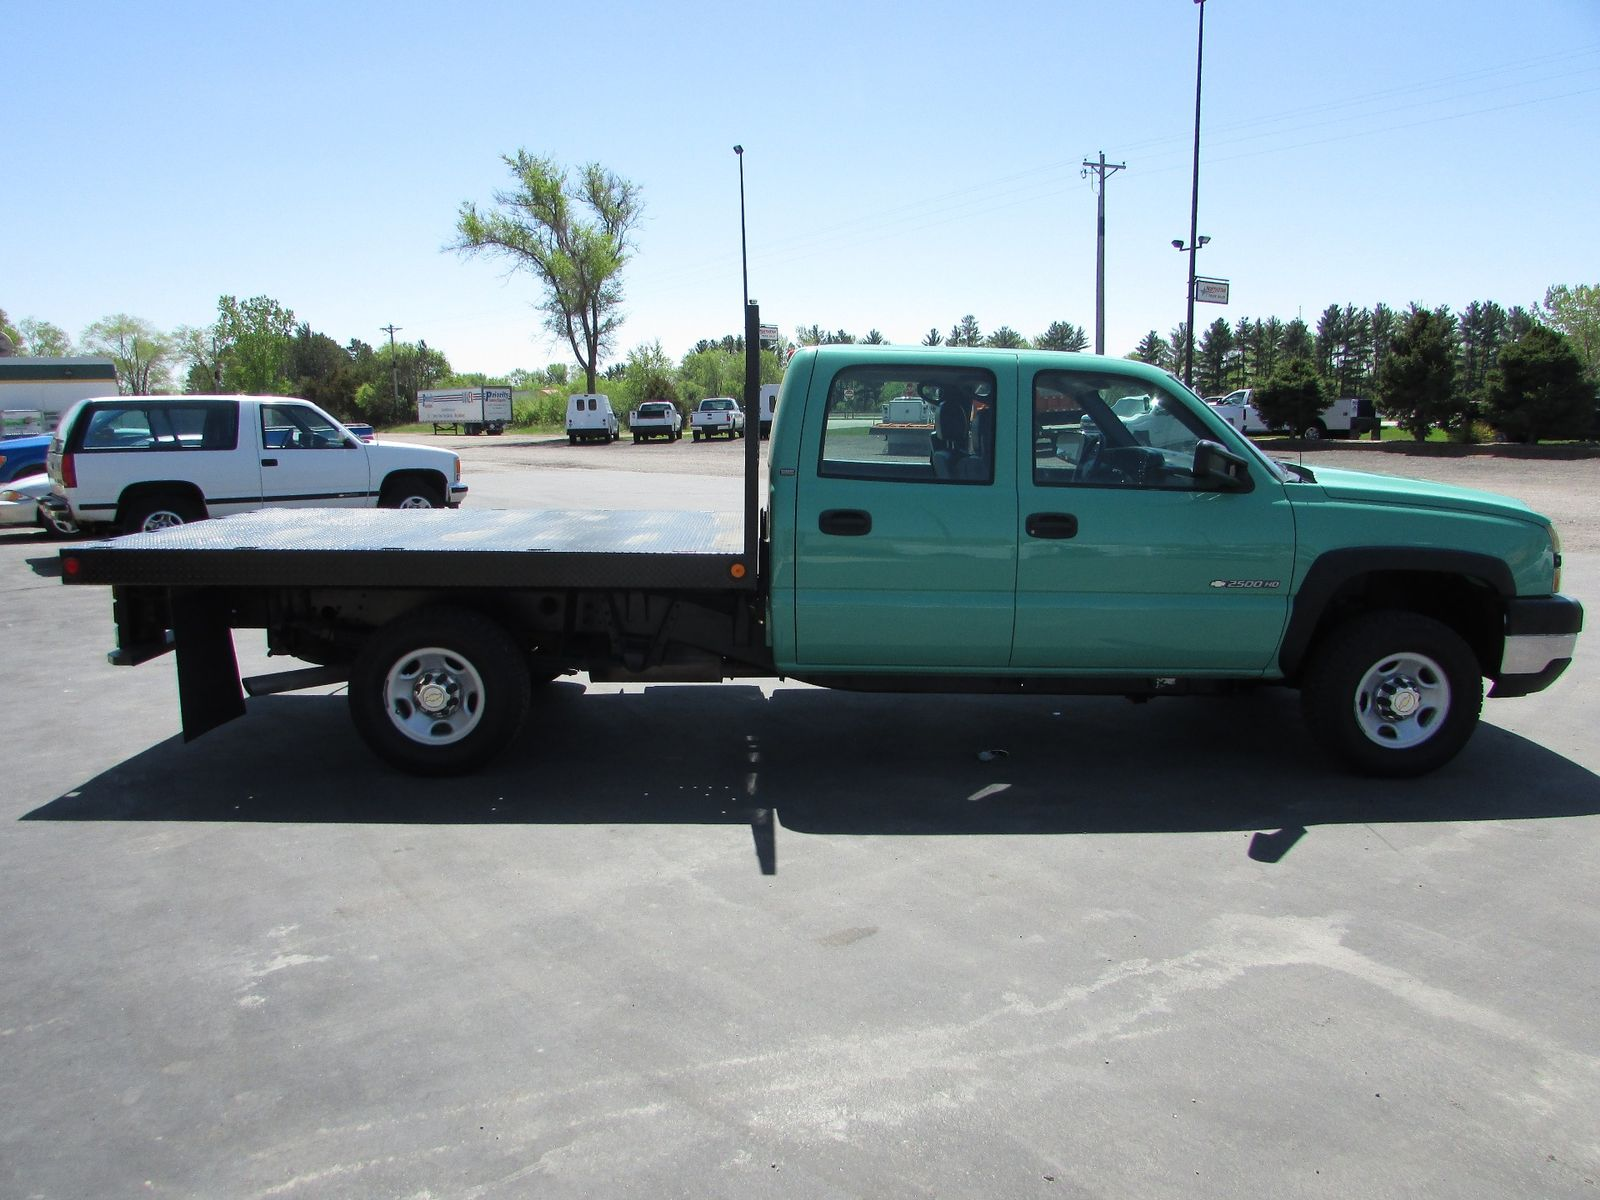 2005 Chevrolet 2500 4x4 Flat Bed Truck St Cloud MN NorthStar Truck Sales